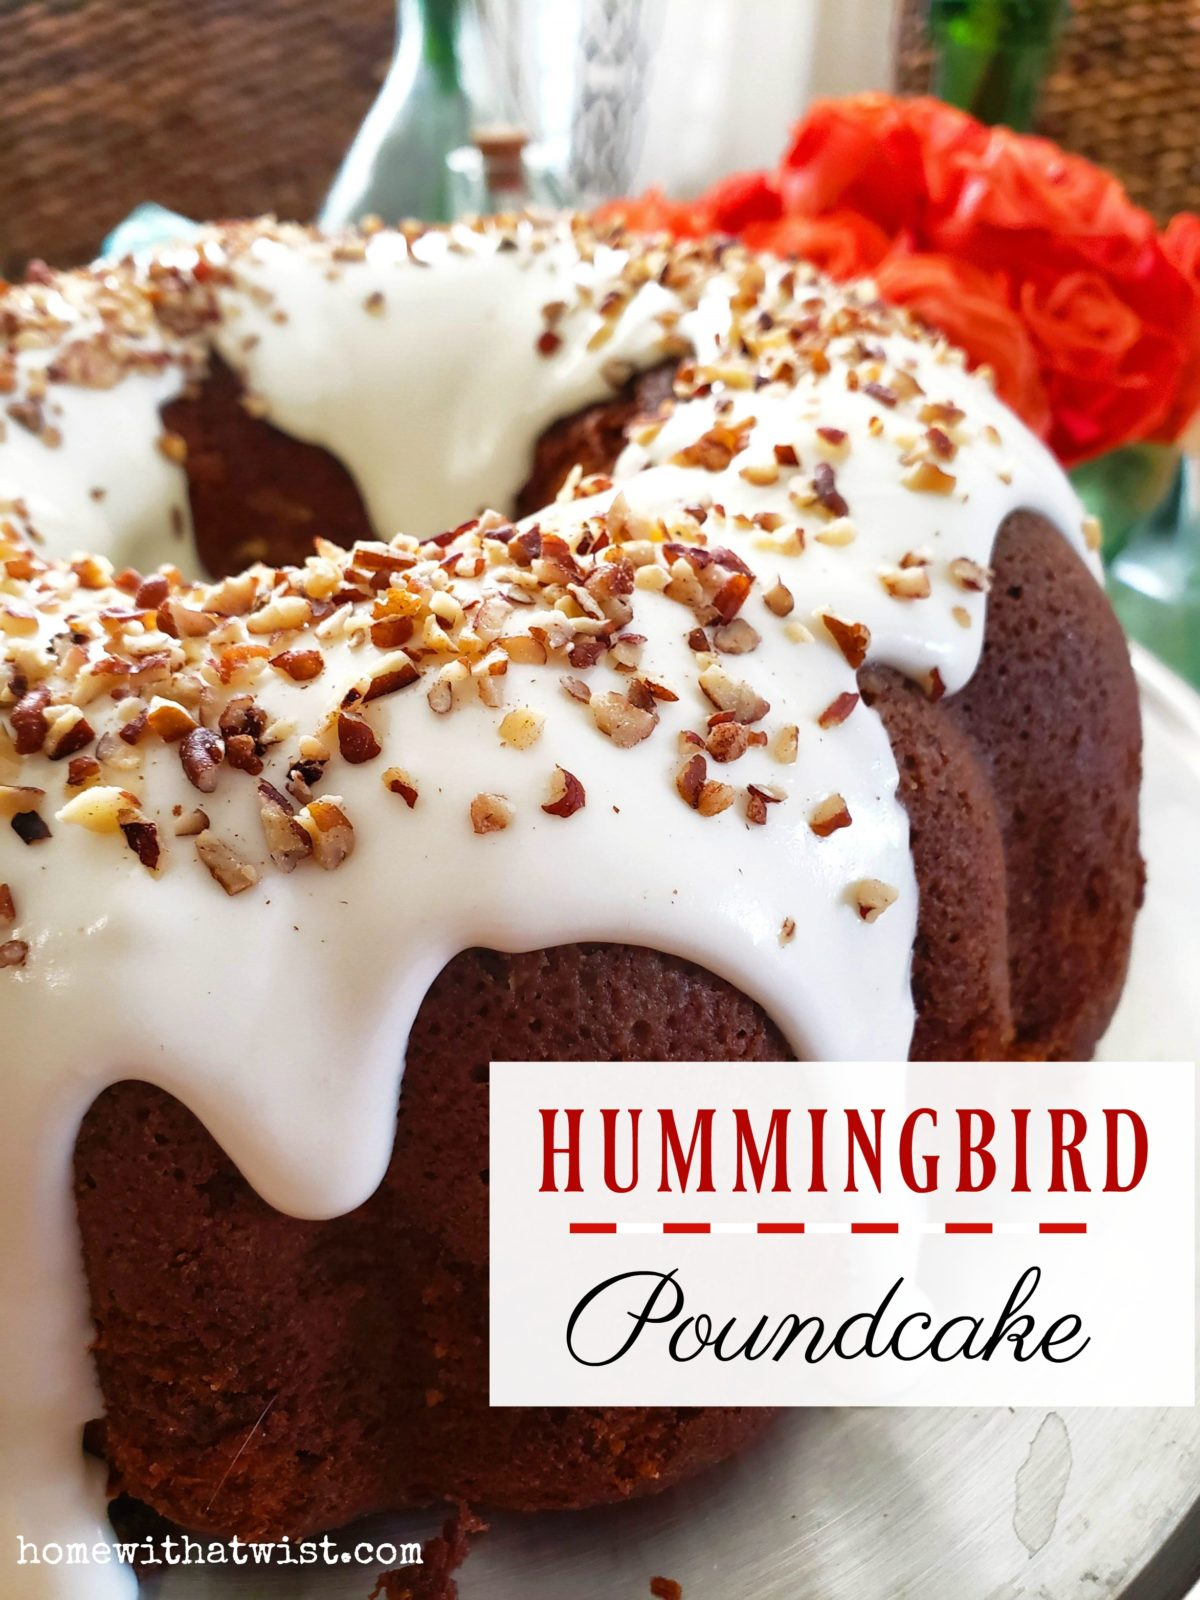 Hummingbird Poundcake